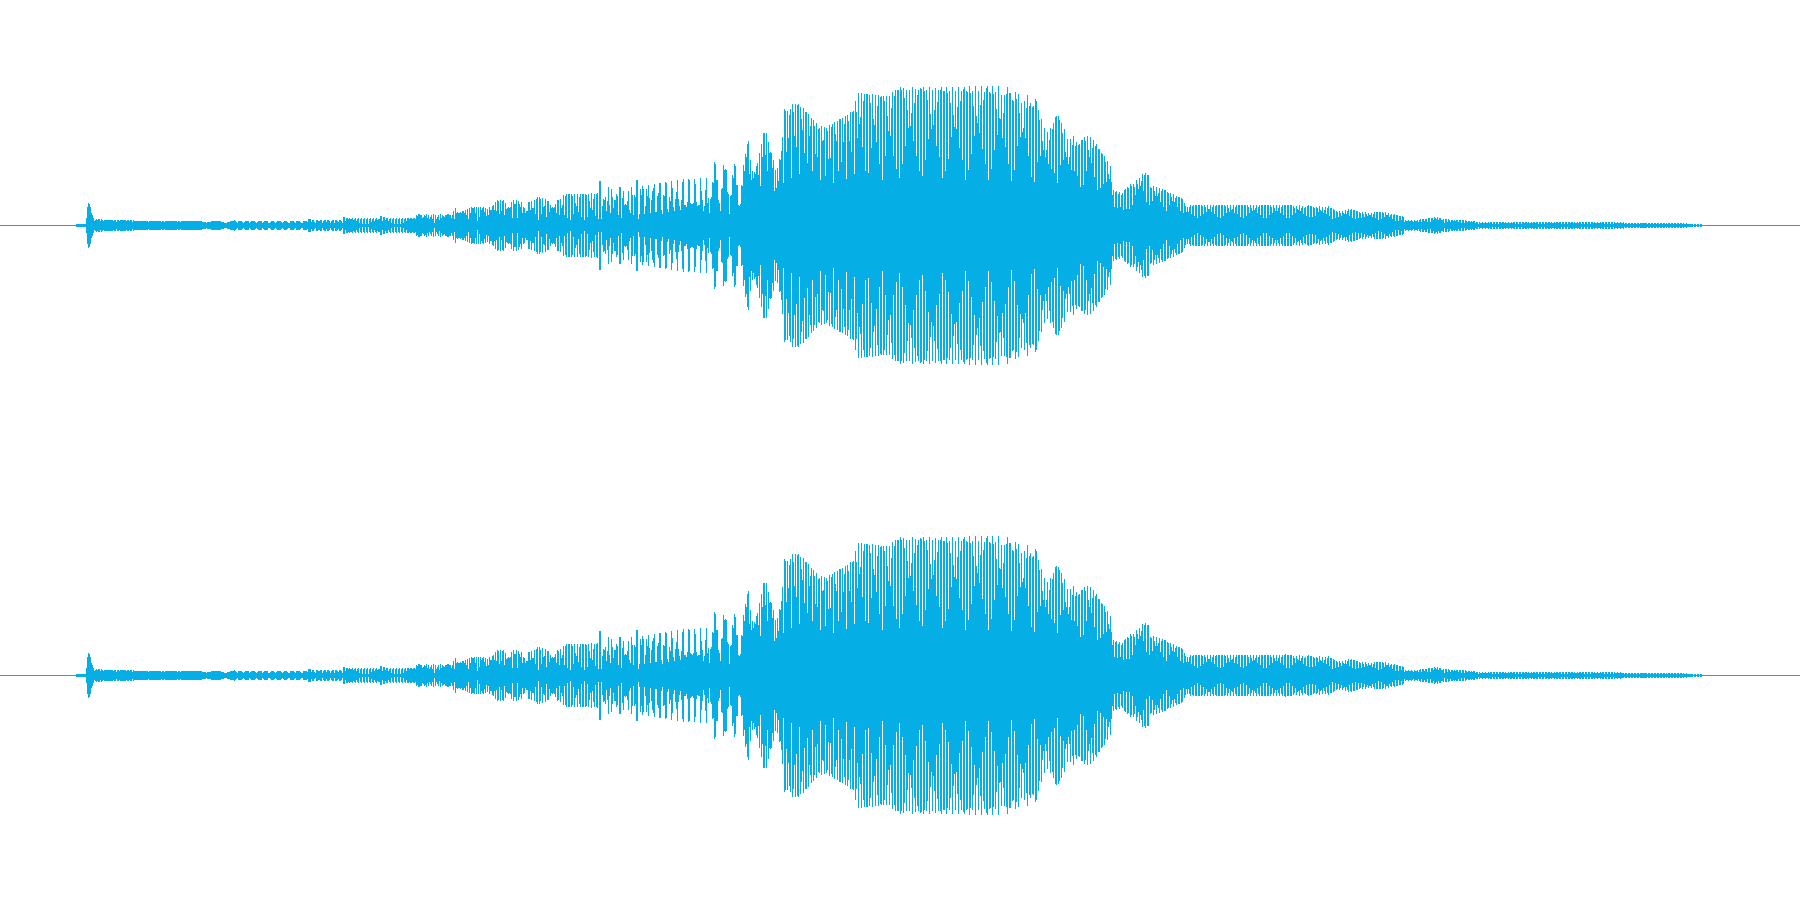 SFっぽい電子音。キャンセルボタンなど…の再生済みの波形